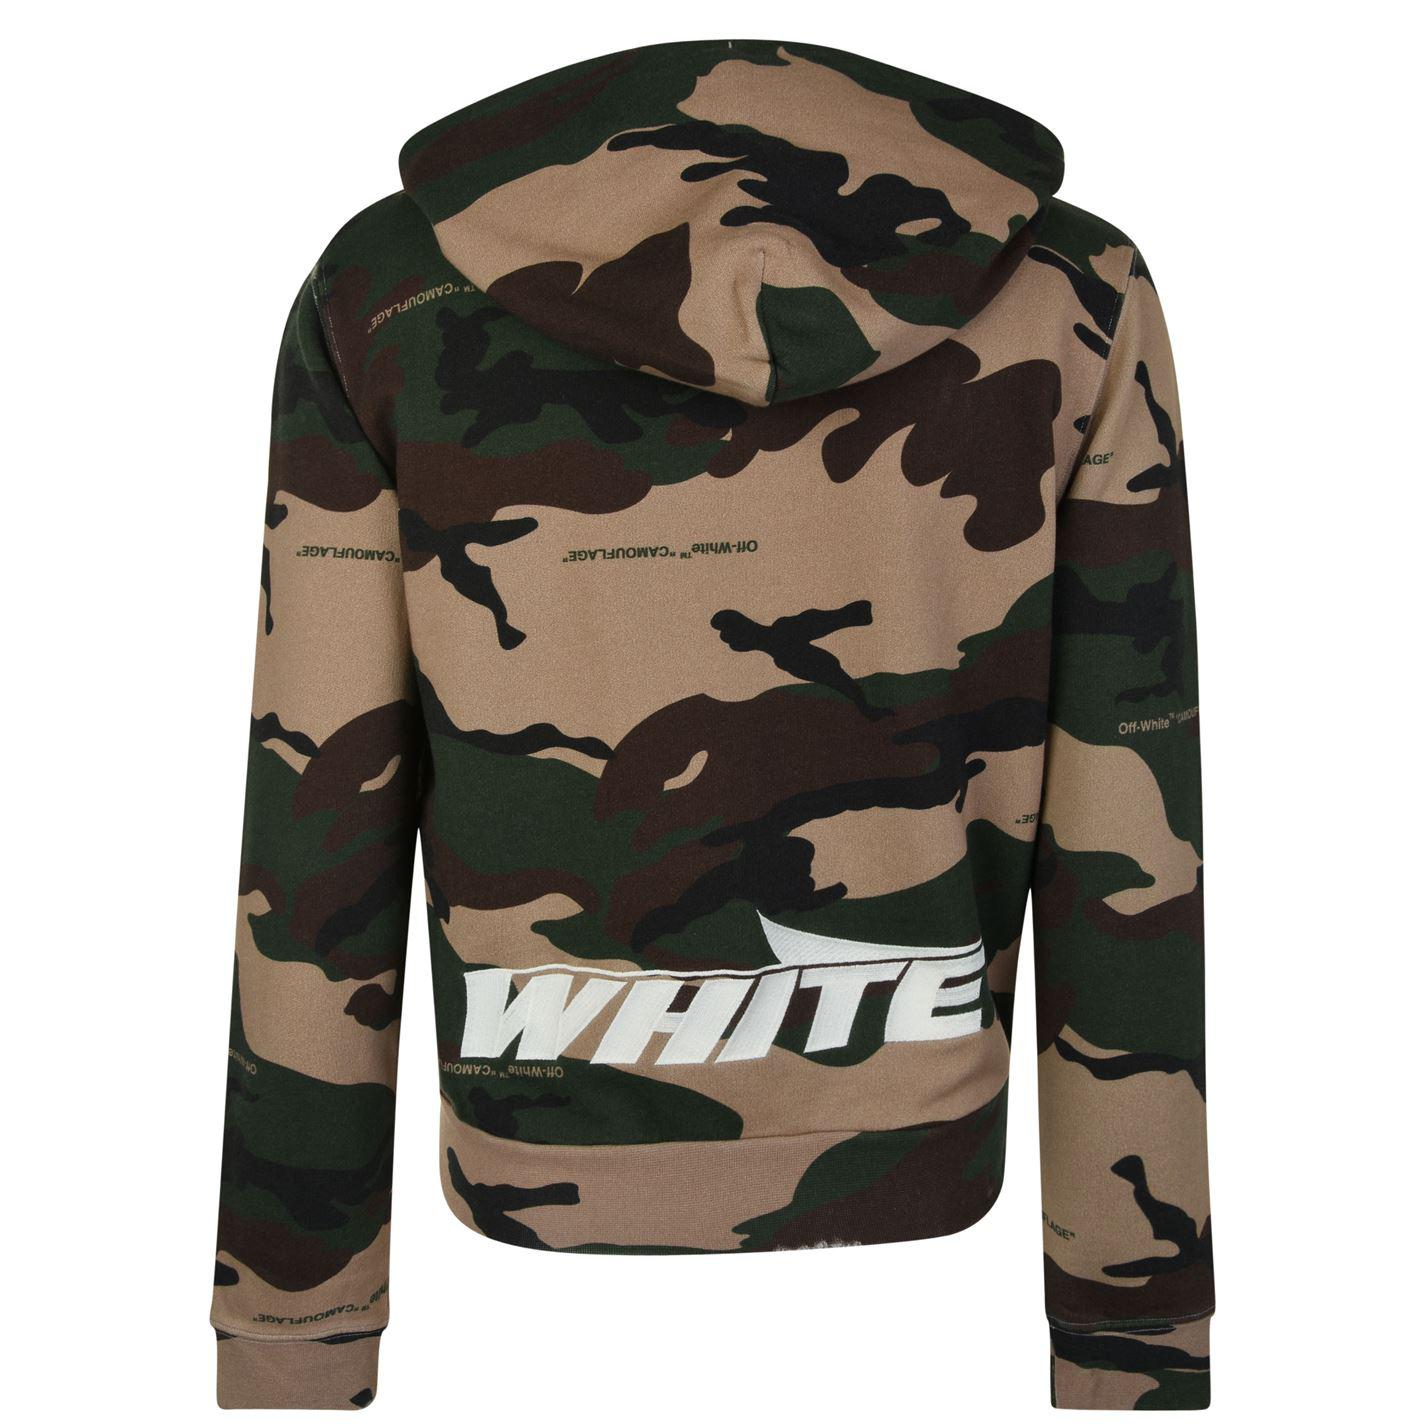 1946664f3257 Lyst - Off-White c o Virgil Abloh Camouflage Zip Hooded Sweatshirt ...